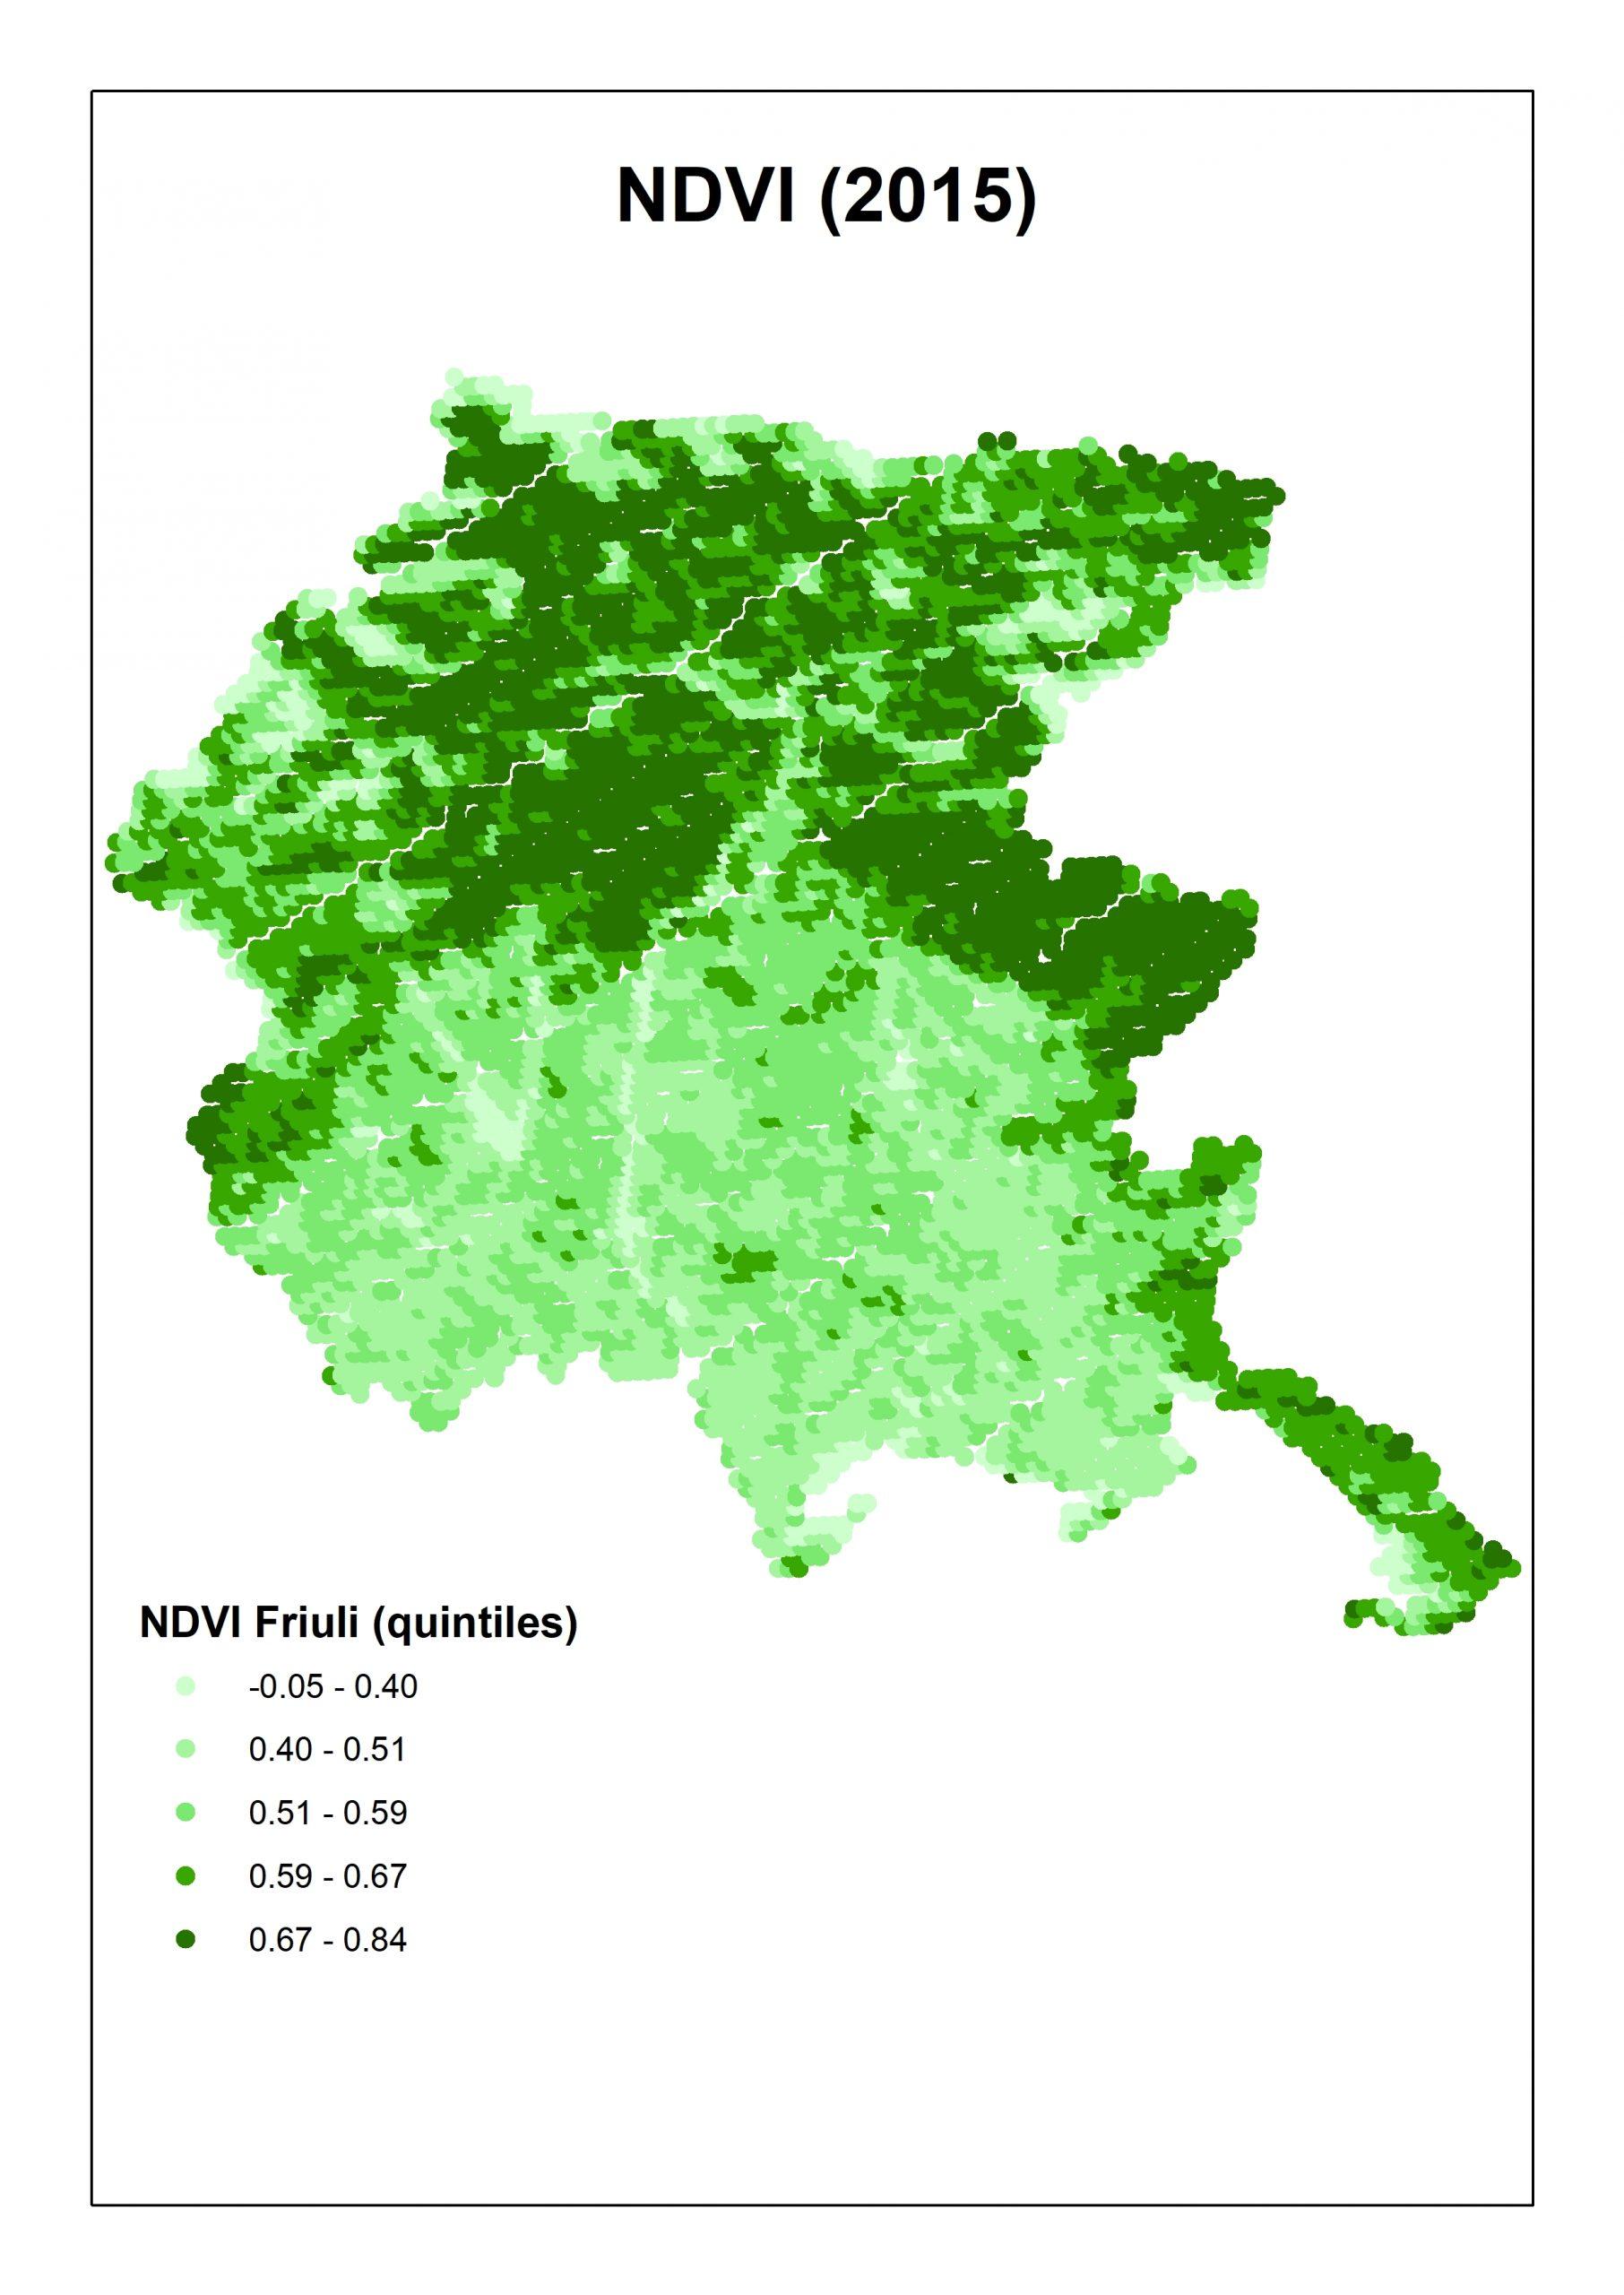 NDVI 2015 Friuli Venezia Giulia